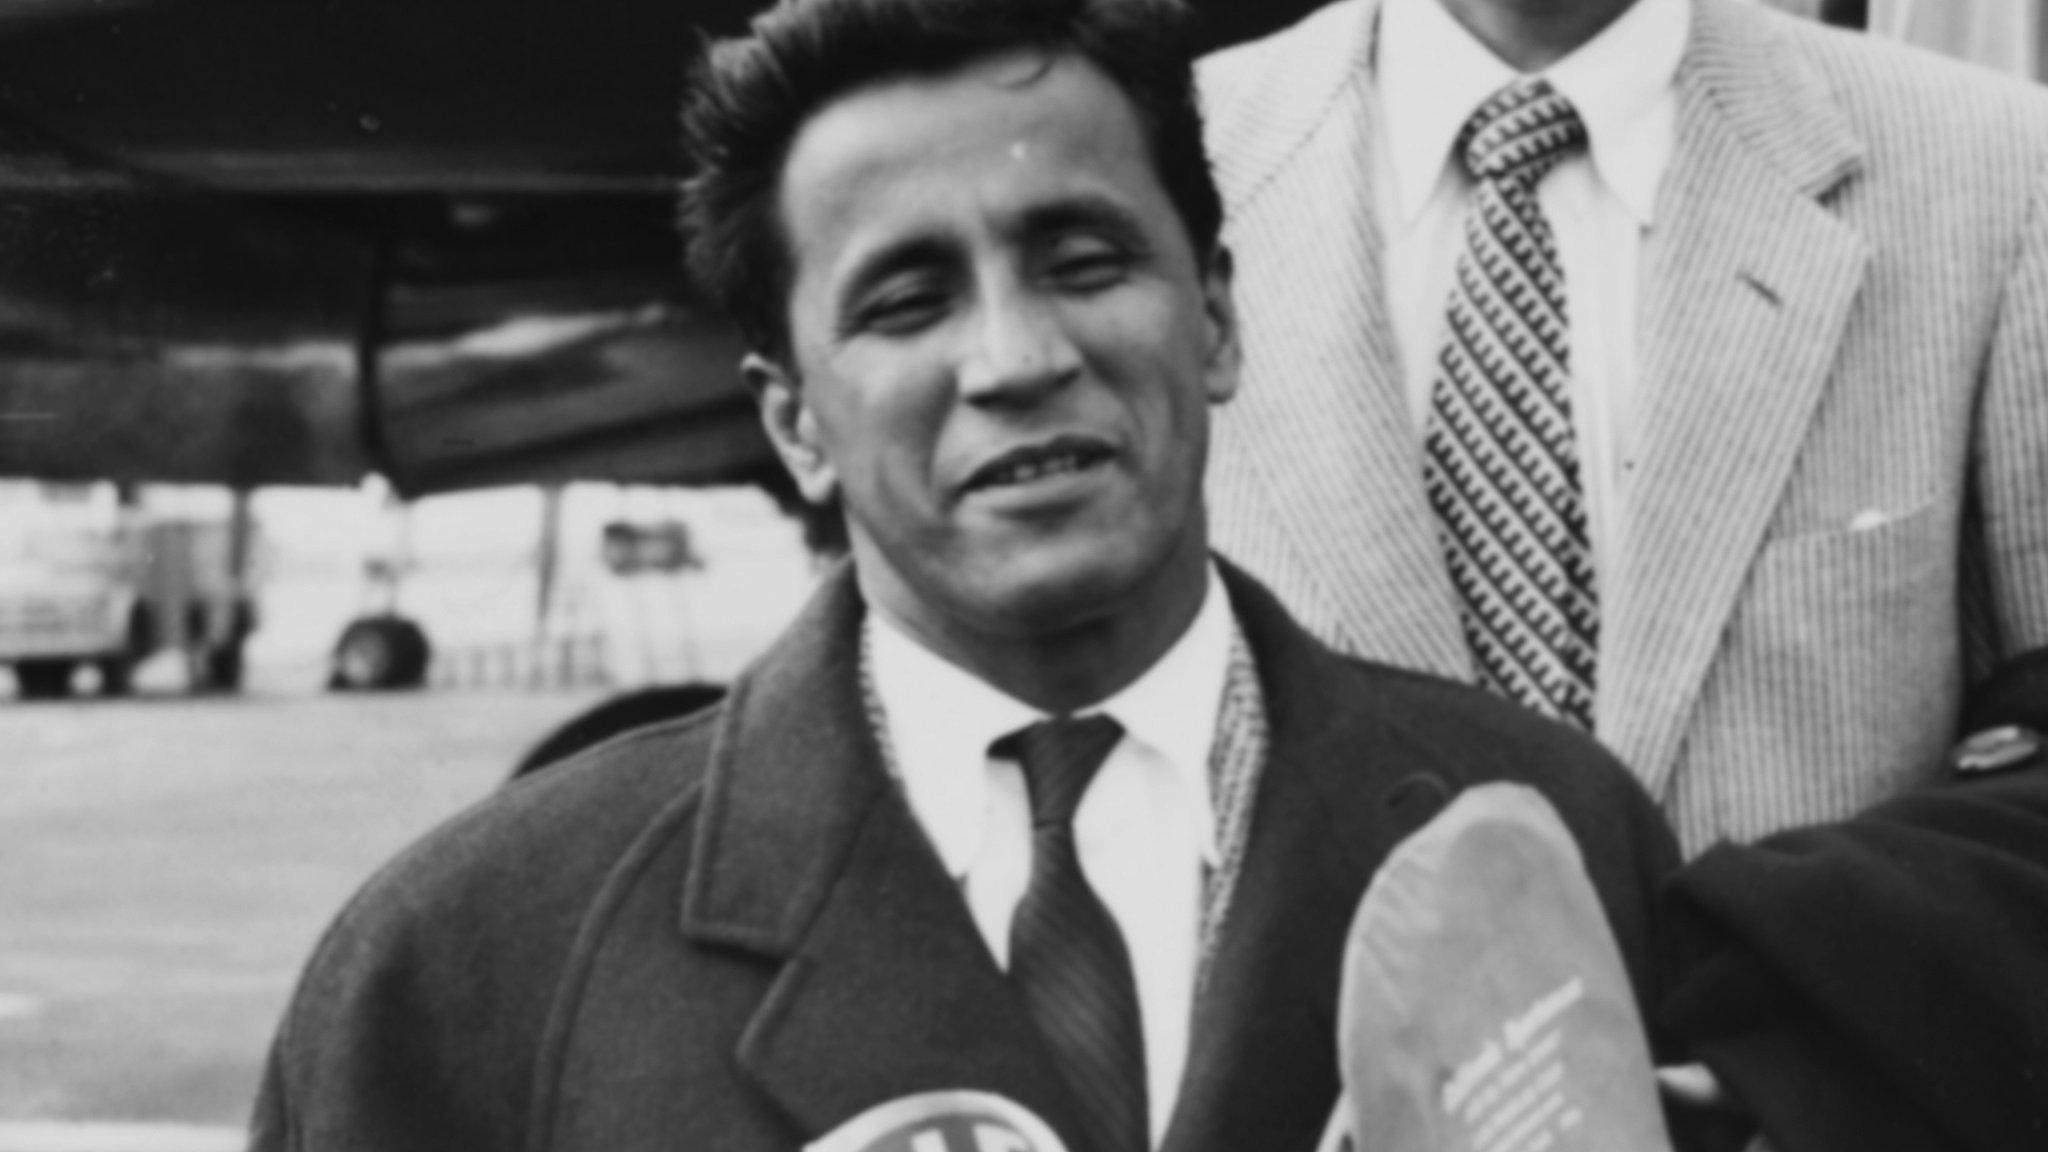 Muere el legendario tenista ecuatoriano Pancho Segura